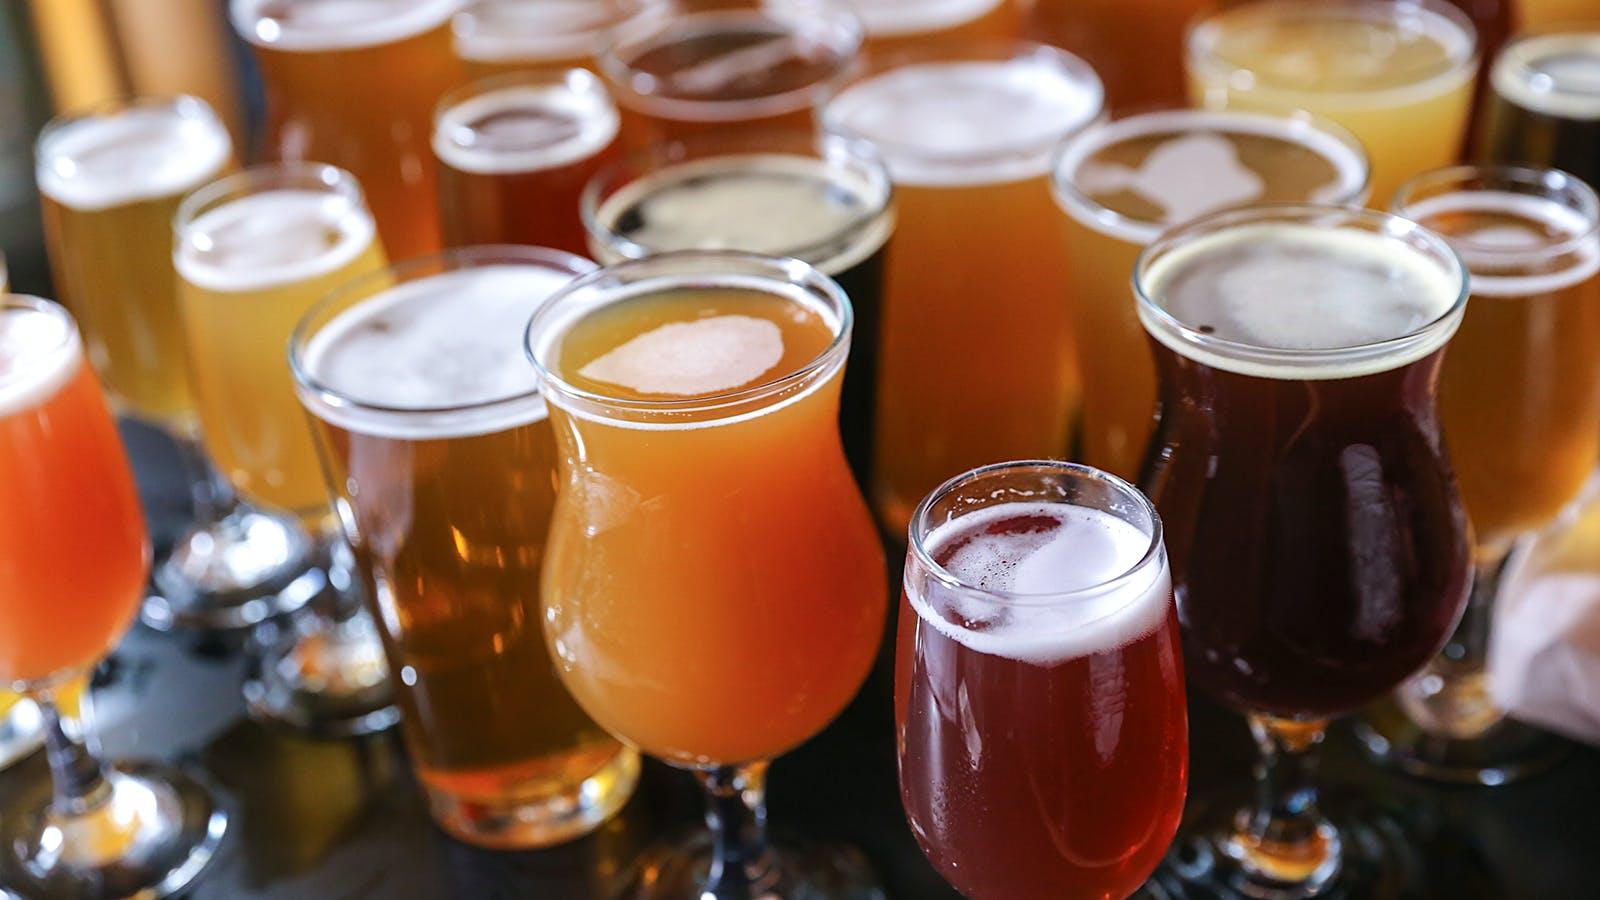 Brettanomyces: Wine Foe, Beer Friend